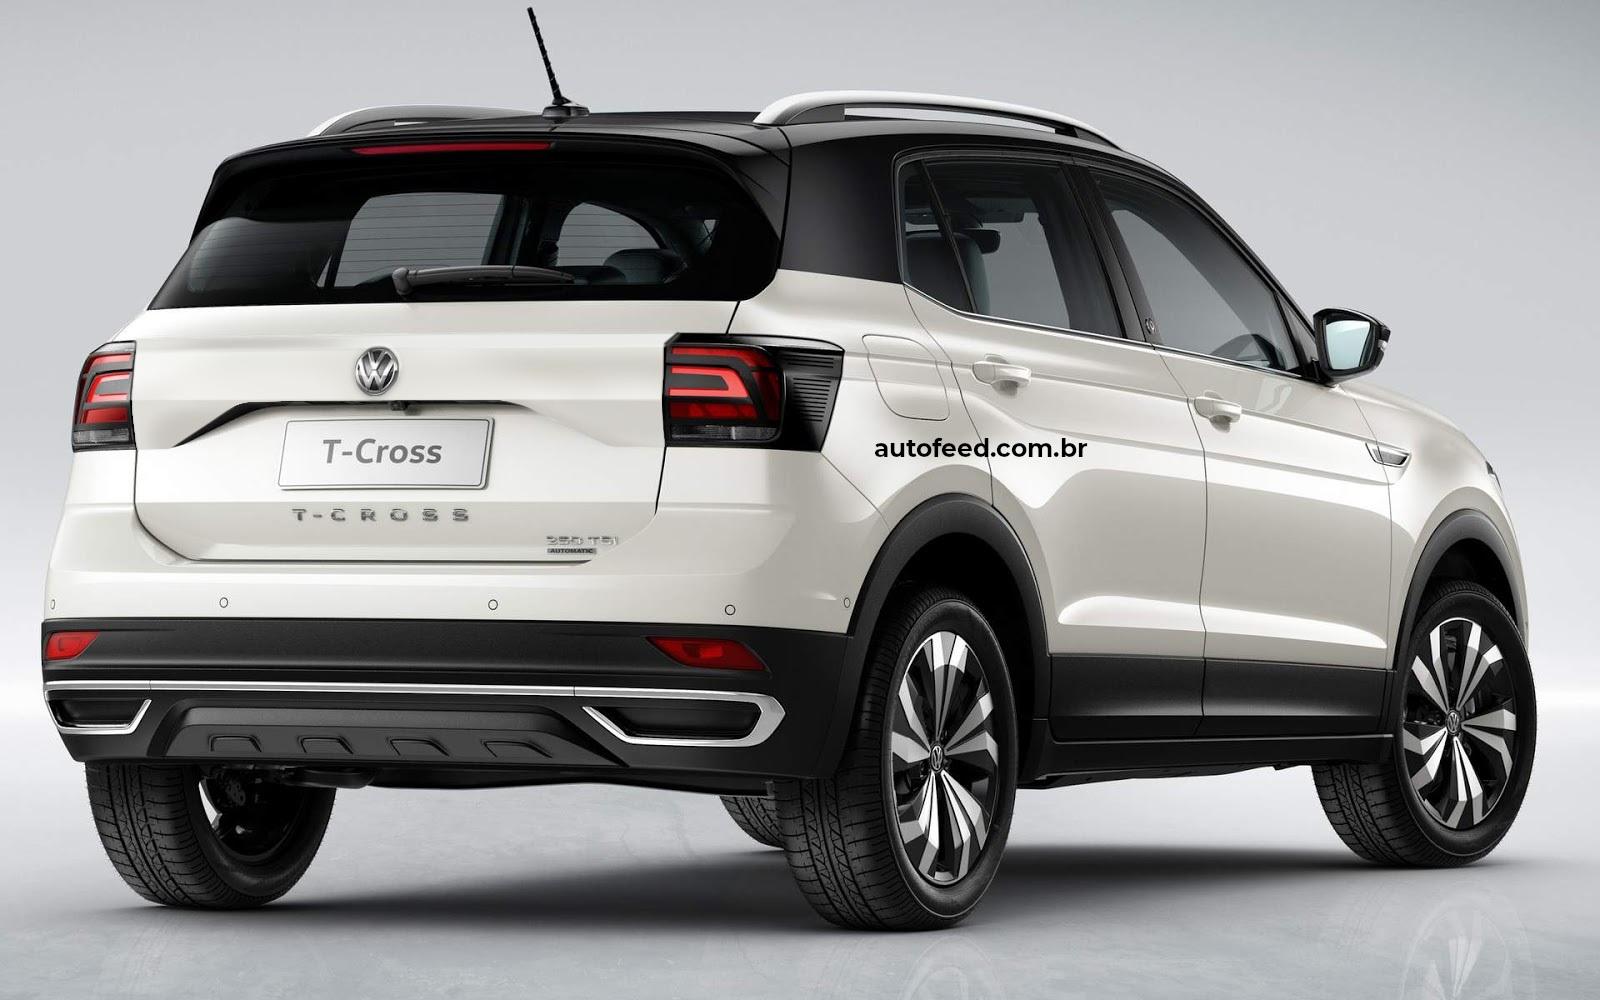 vw-t-cross-vw-nivus-2020-2021-projecao-branco-vermelho-volkswagen-rebaixado-projecao